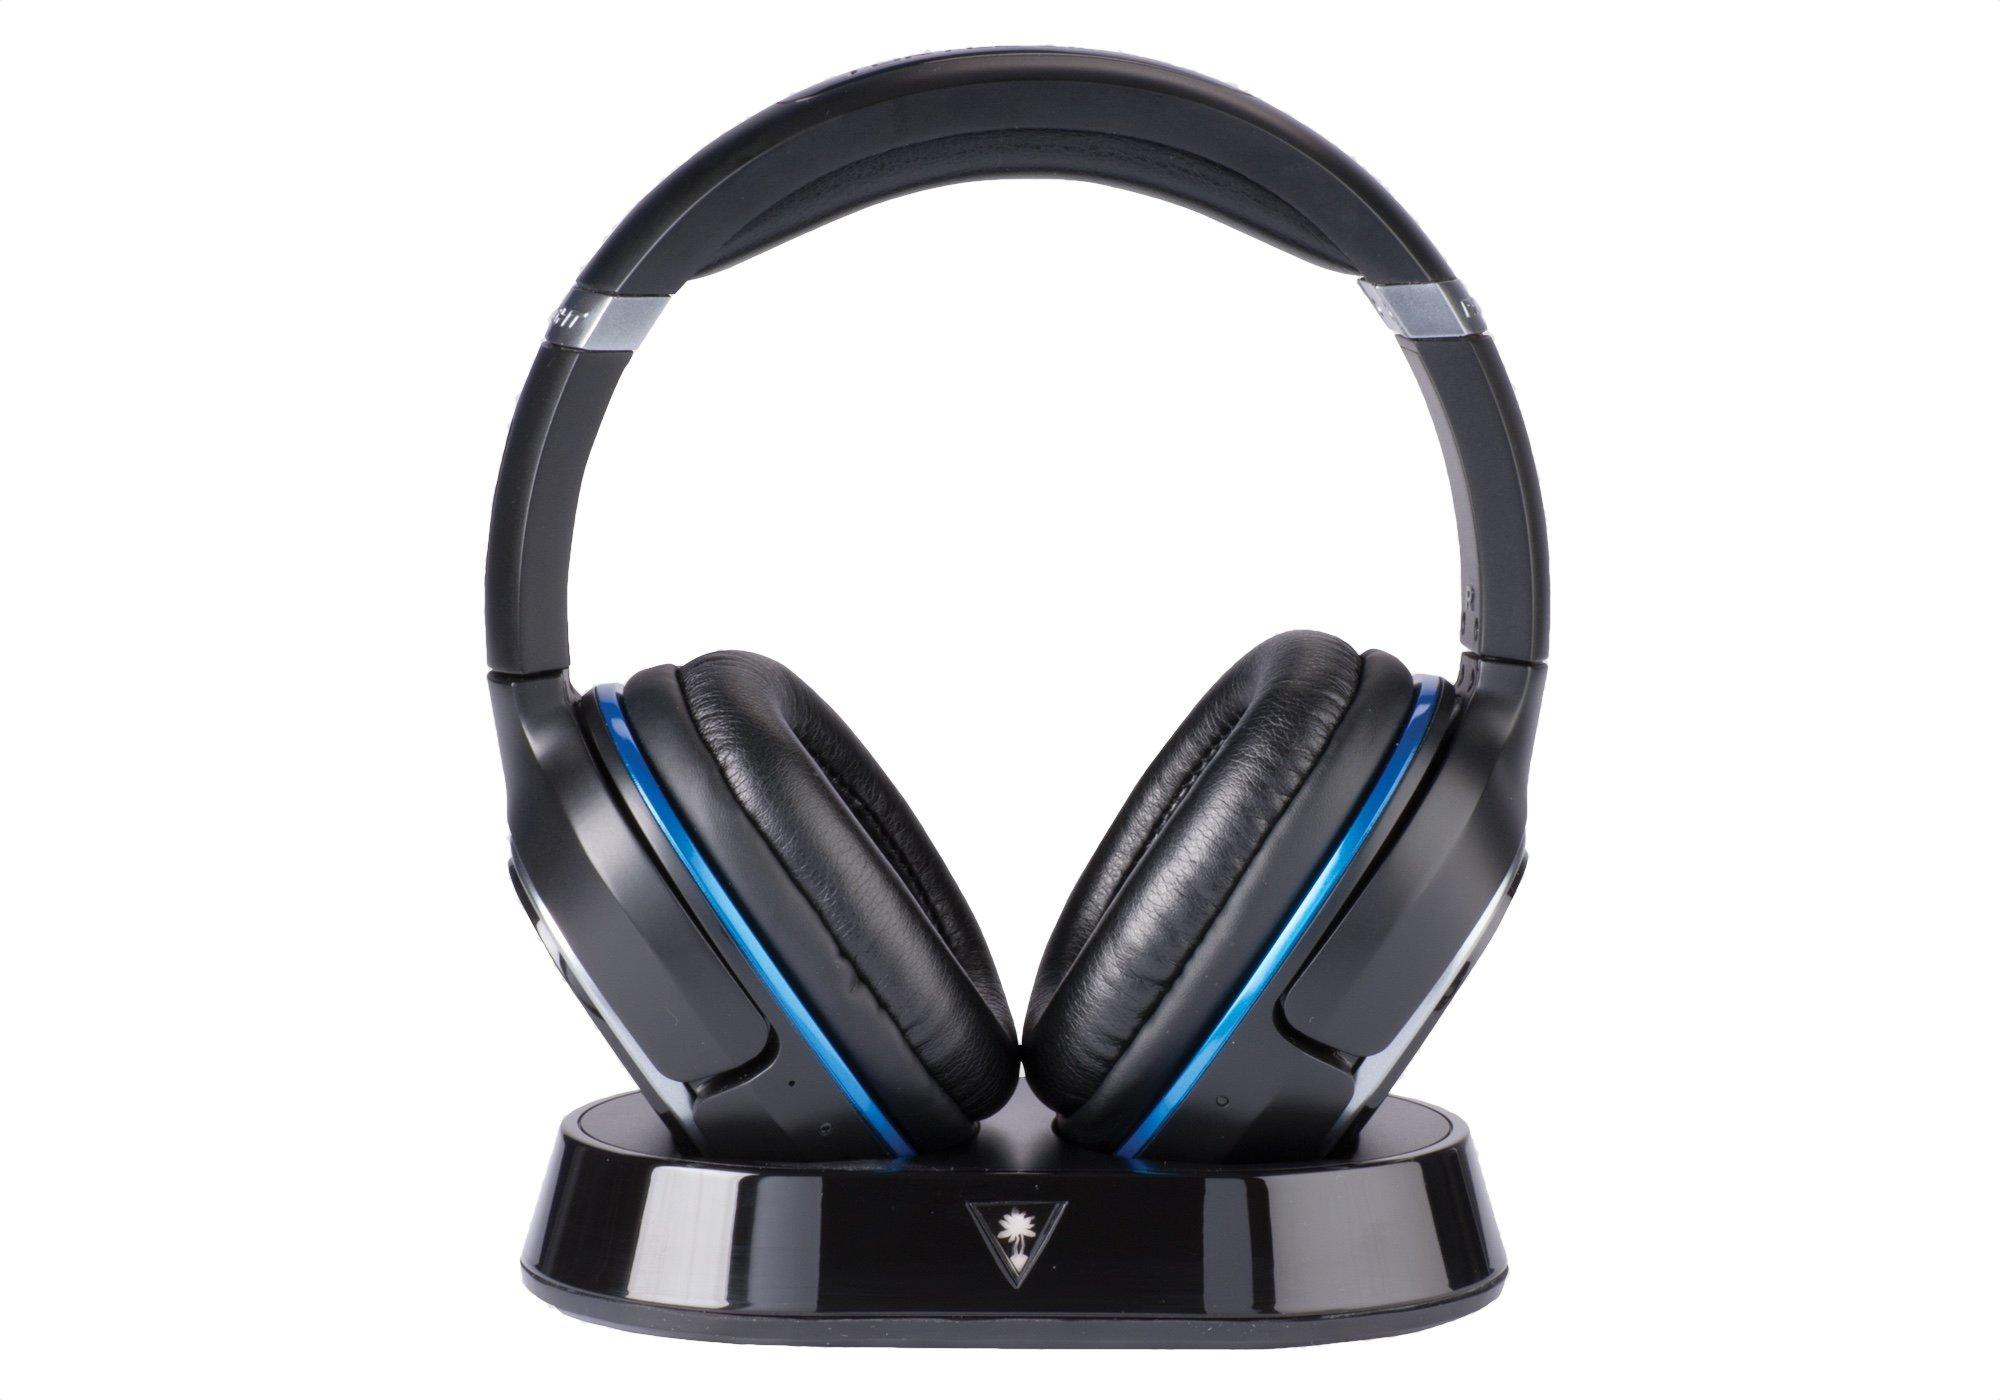 Cuffie Wireless per PS4  Turtle Beach Elite 800P e X d2eed2d13777